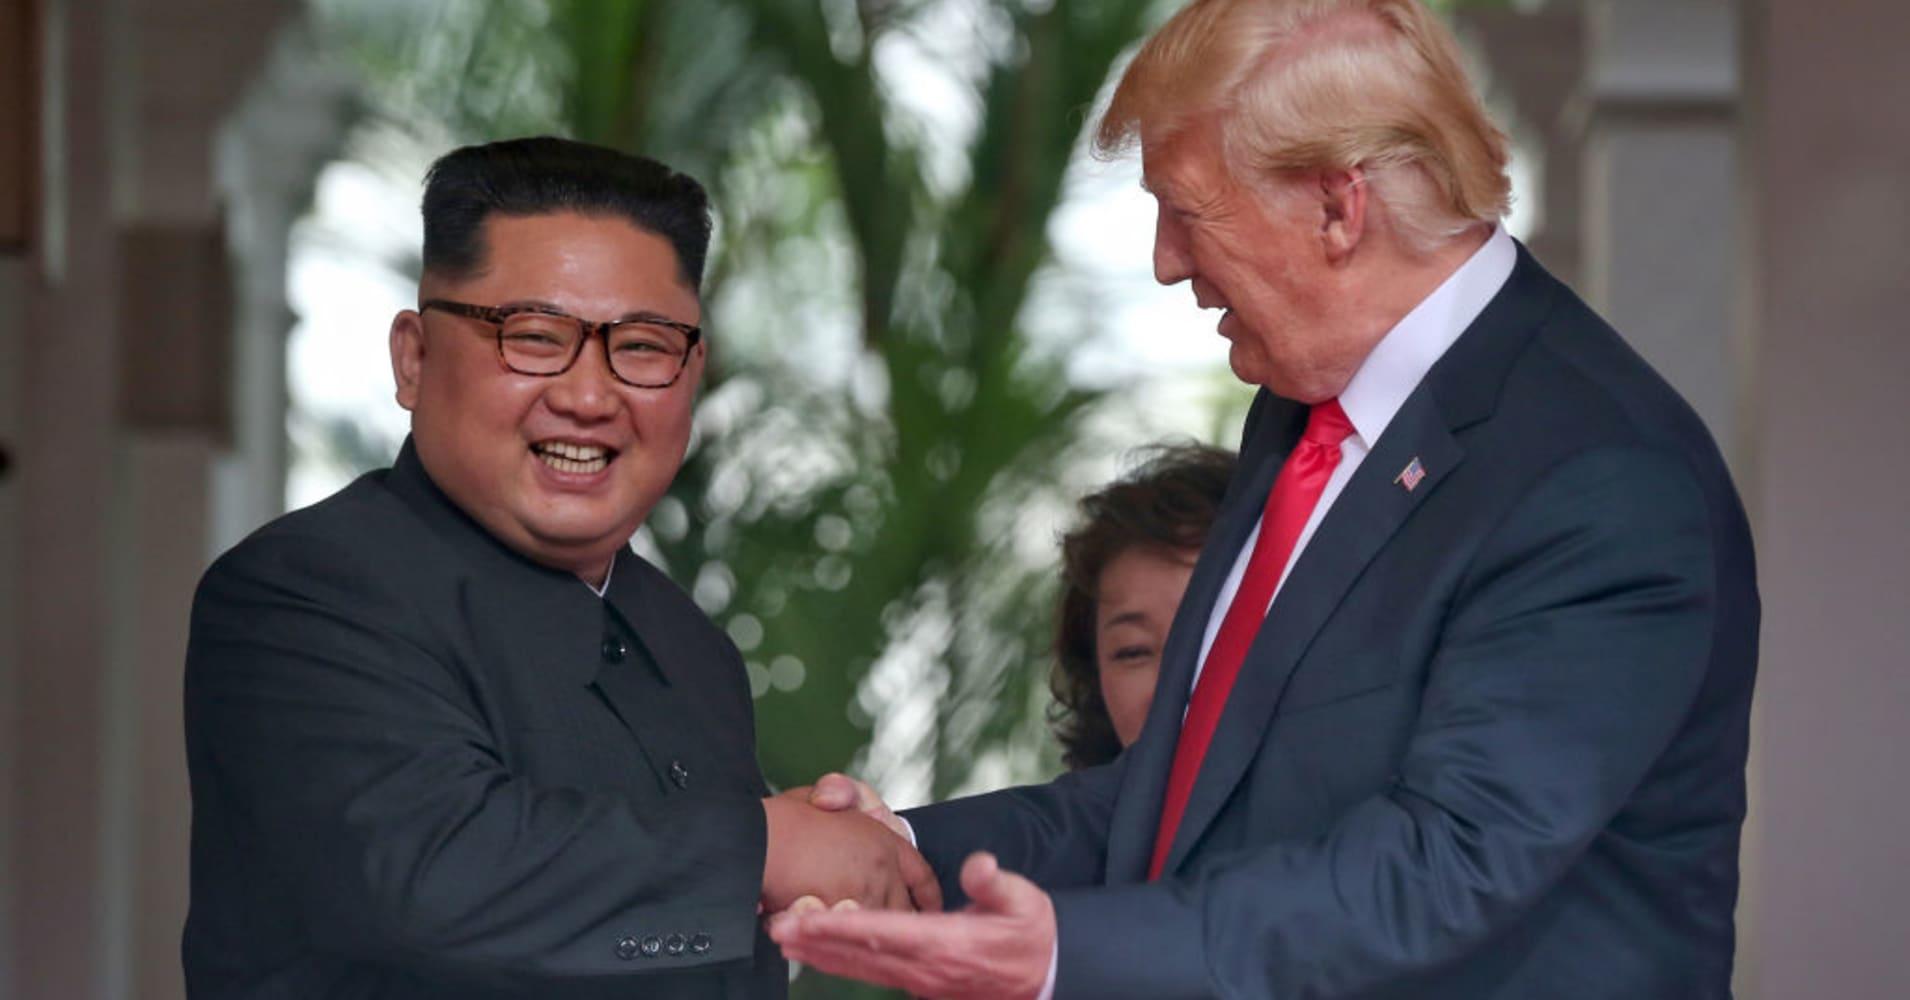 US and North Korean officials met in Hanoi to discuss Trump-Kim summit